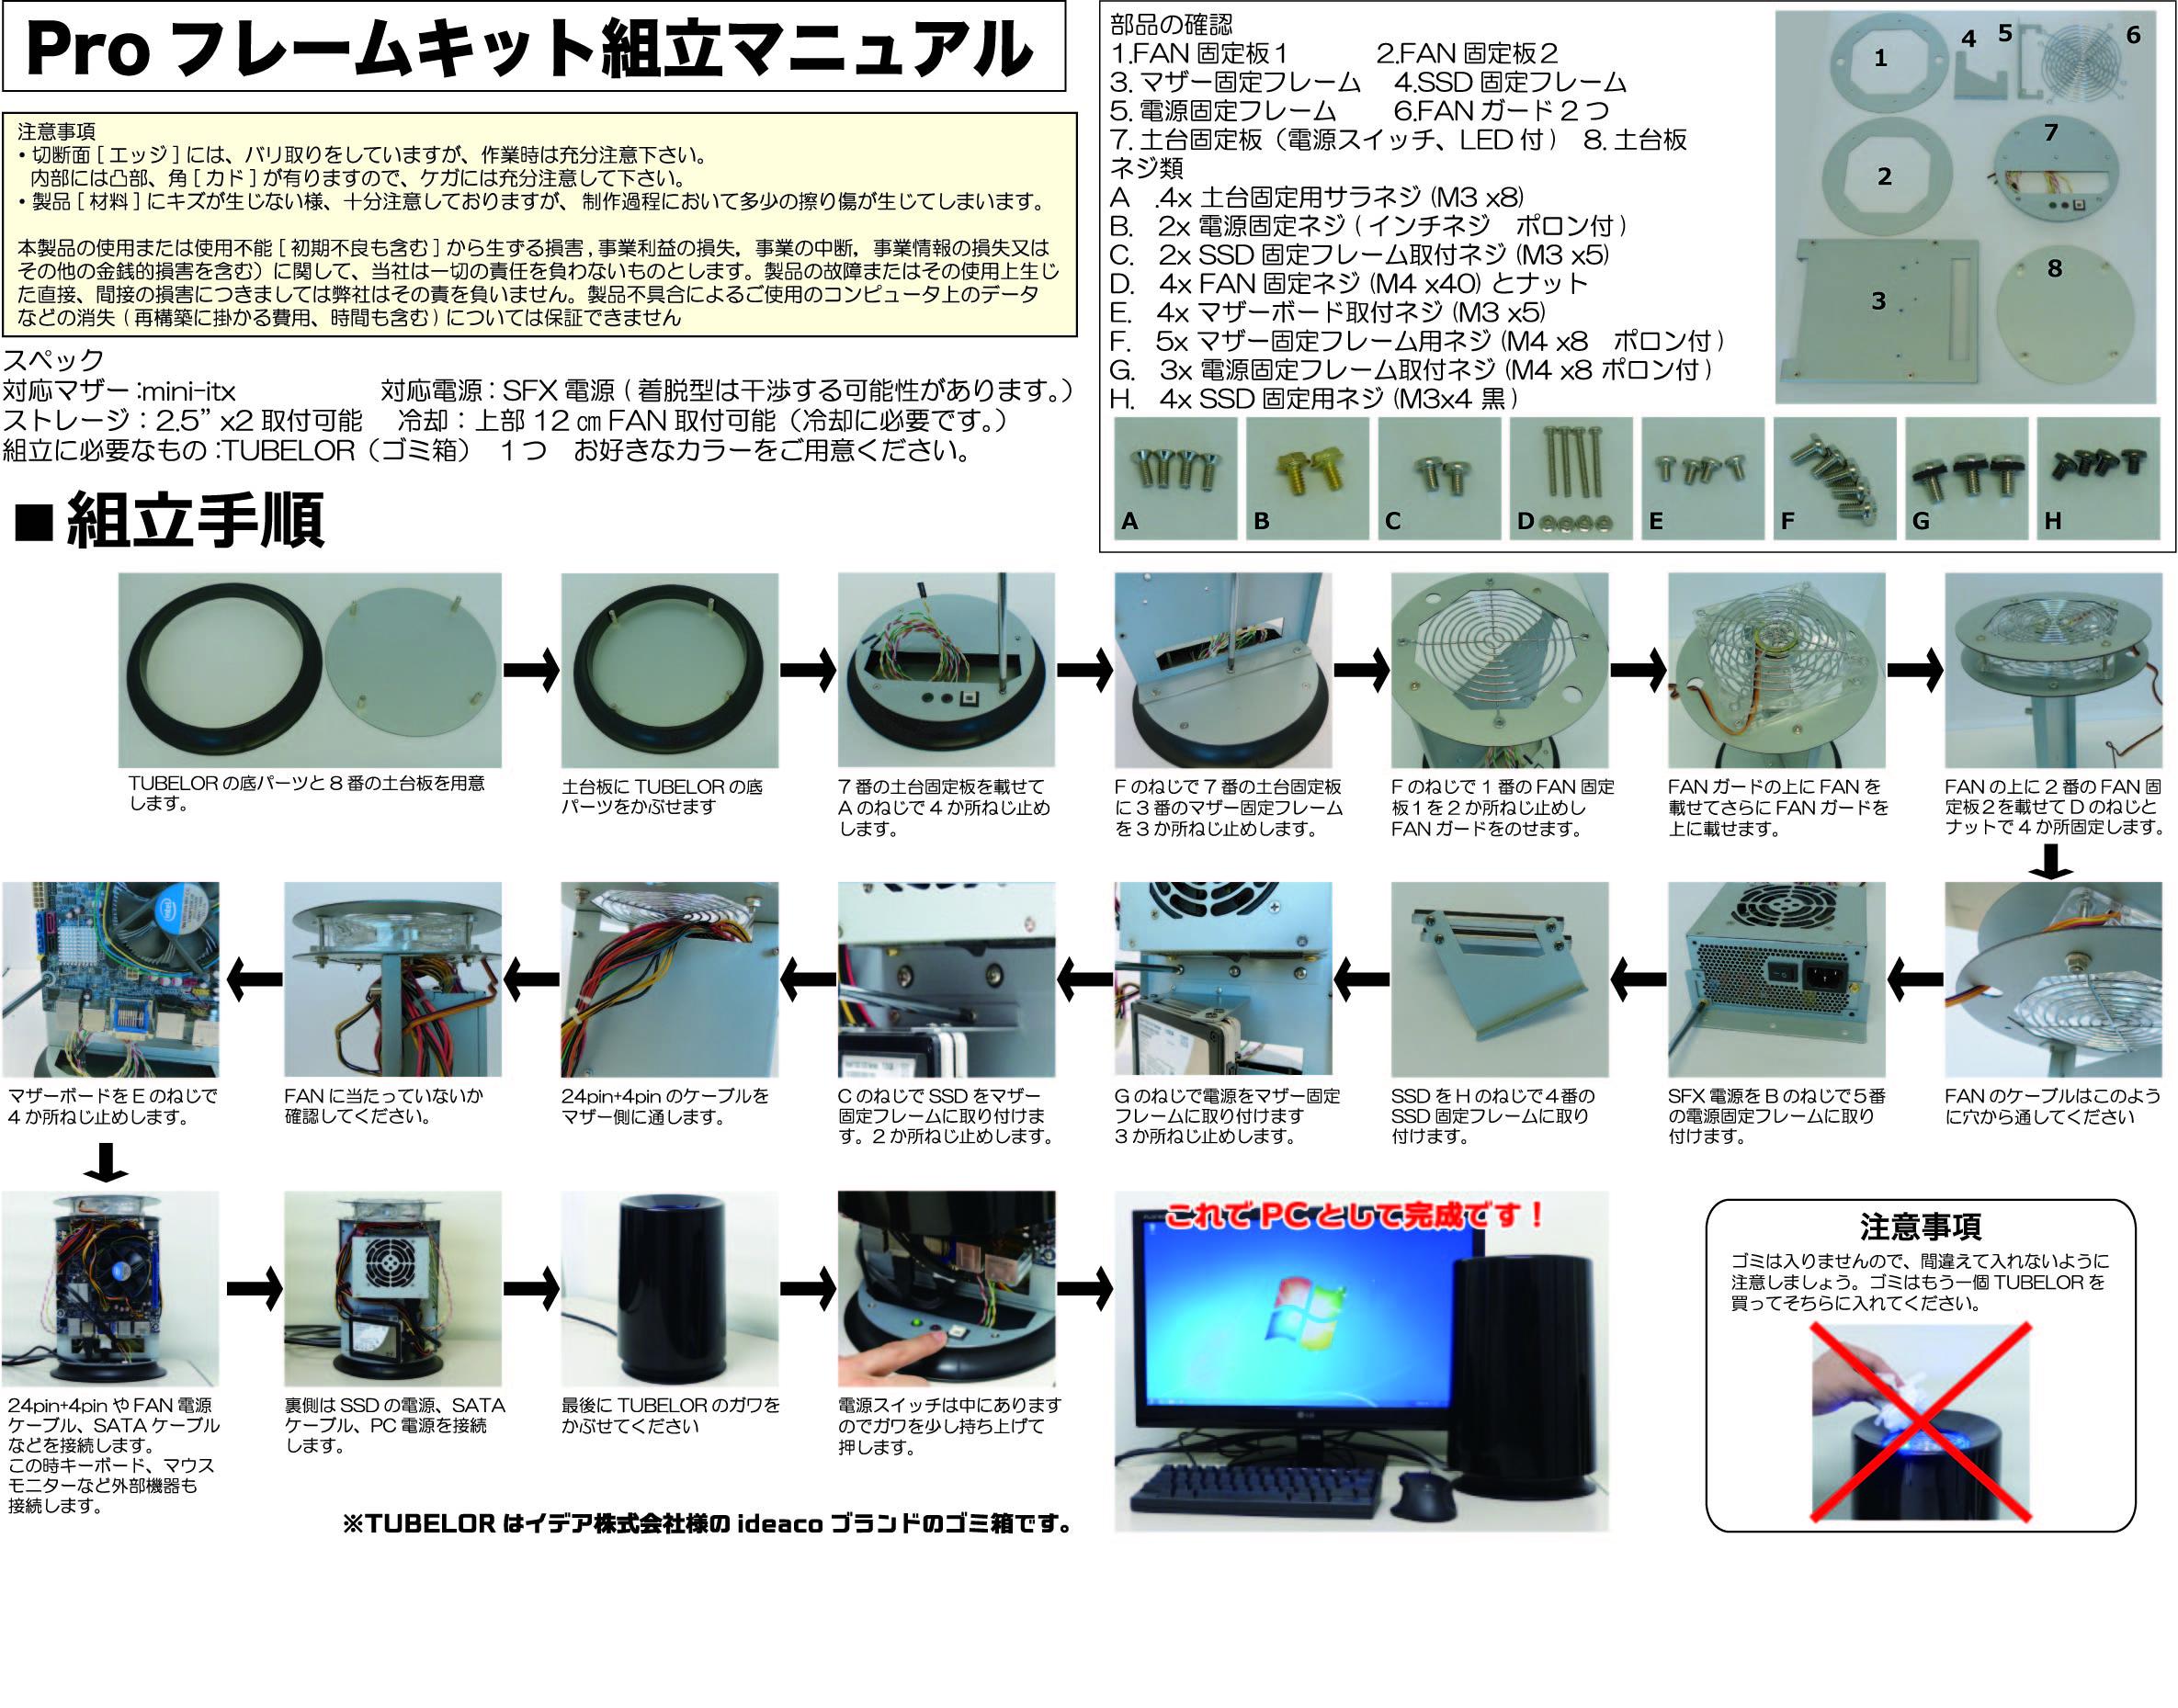 http://www.aiuto-jp.co.jp/news/entryimg/%E3%82%B4%E3%83%9F%E7%AE%B1%E3%83%9E%E3%83%8B%E3%83%A5%E3%82%A2%E3%83%ABver3-out.jpg